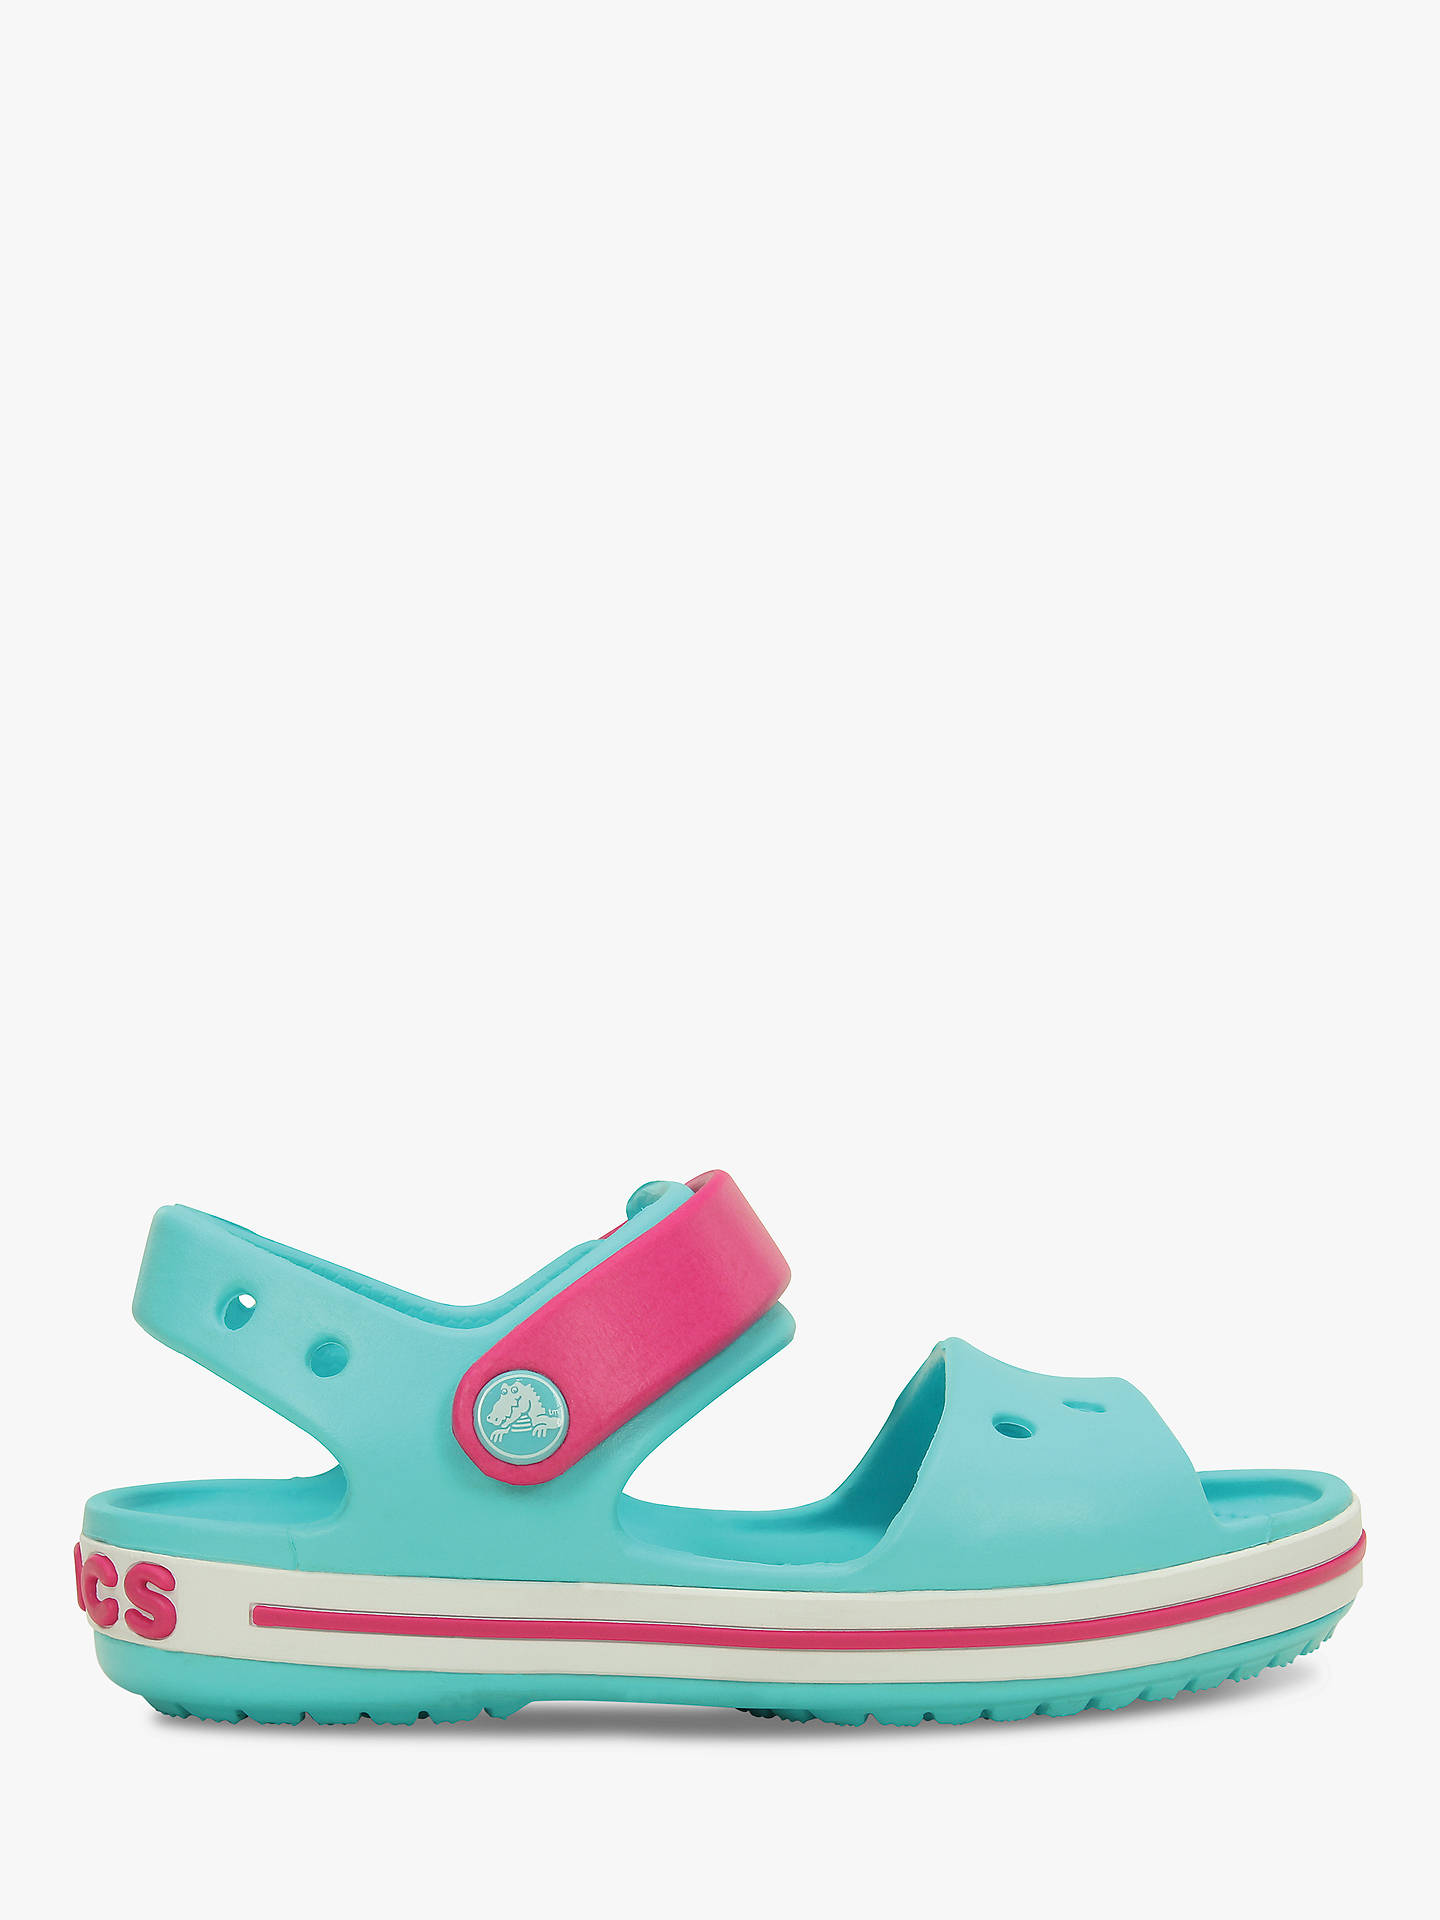 6d4b98de8449 Buy Crocs Children s Crocband Sandals